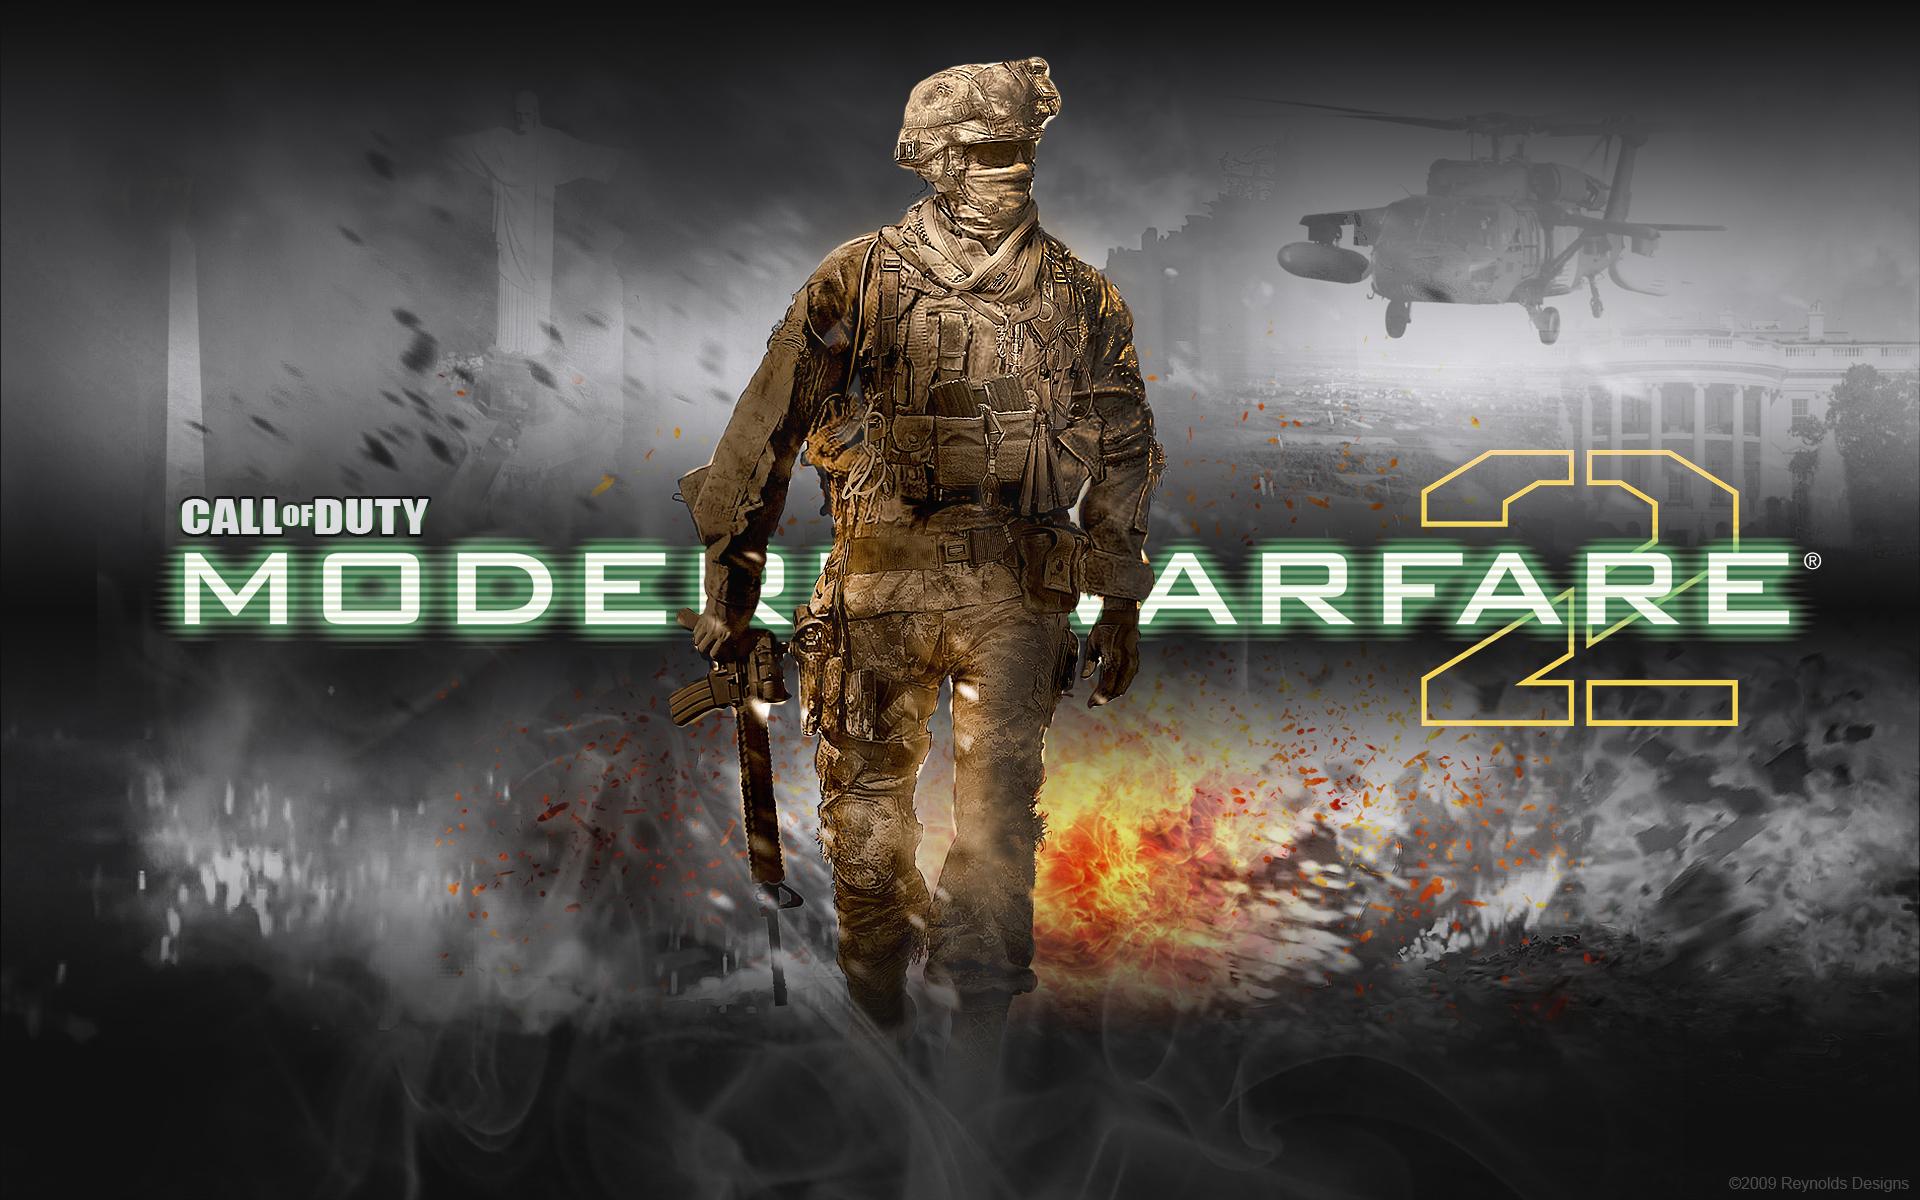 Modern Warfare 2 Wallpaper By Creynolds25 On Deviantart